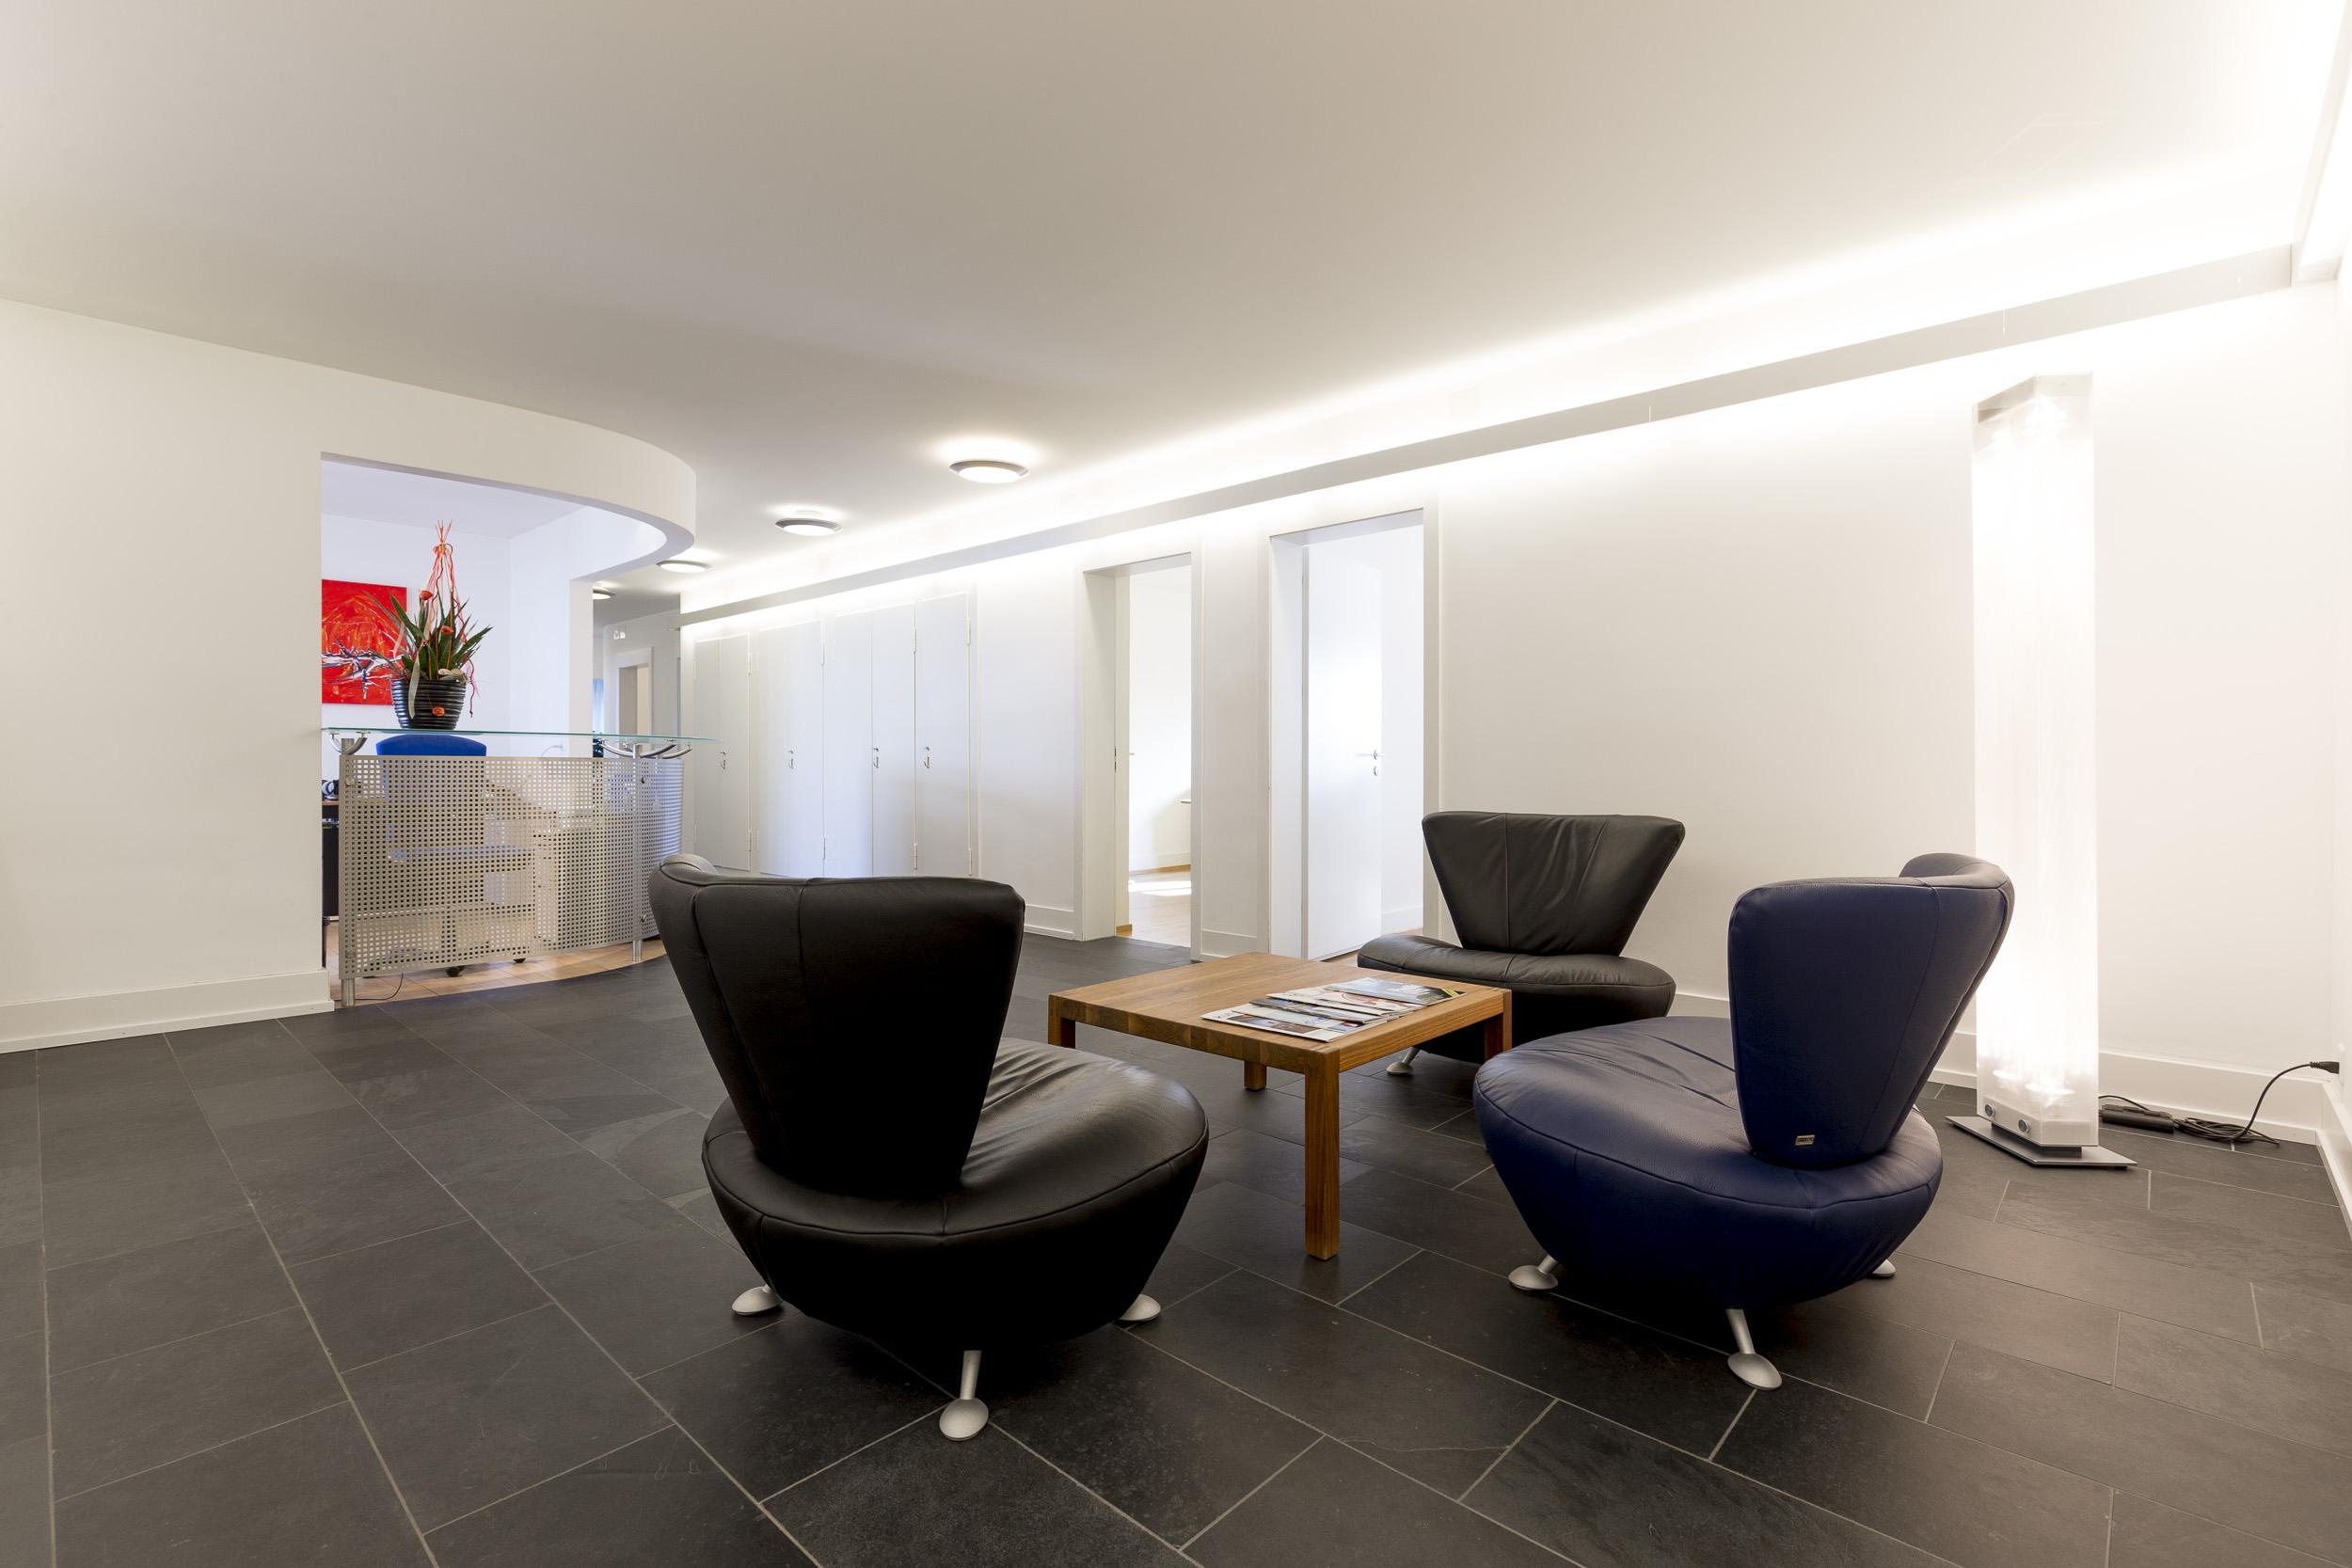 eingangsbereich 1 swisspersonal. Black Bedroom Furniture Sets. Home Design Ideas